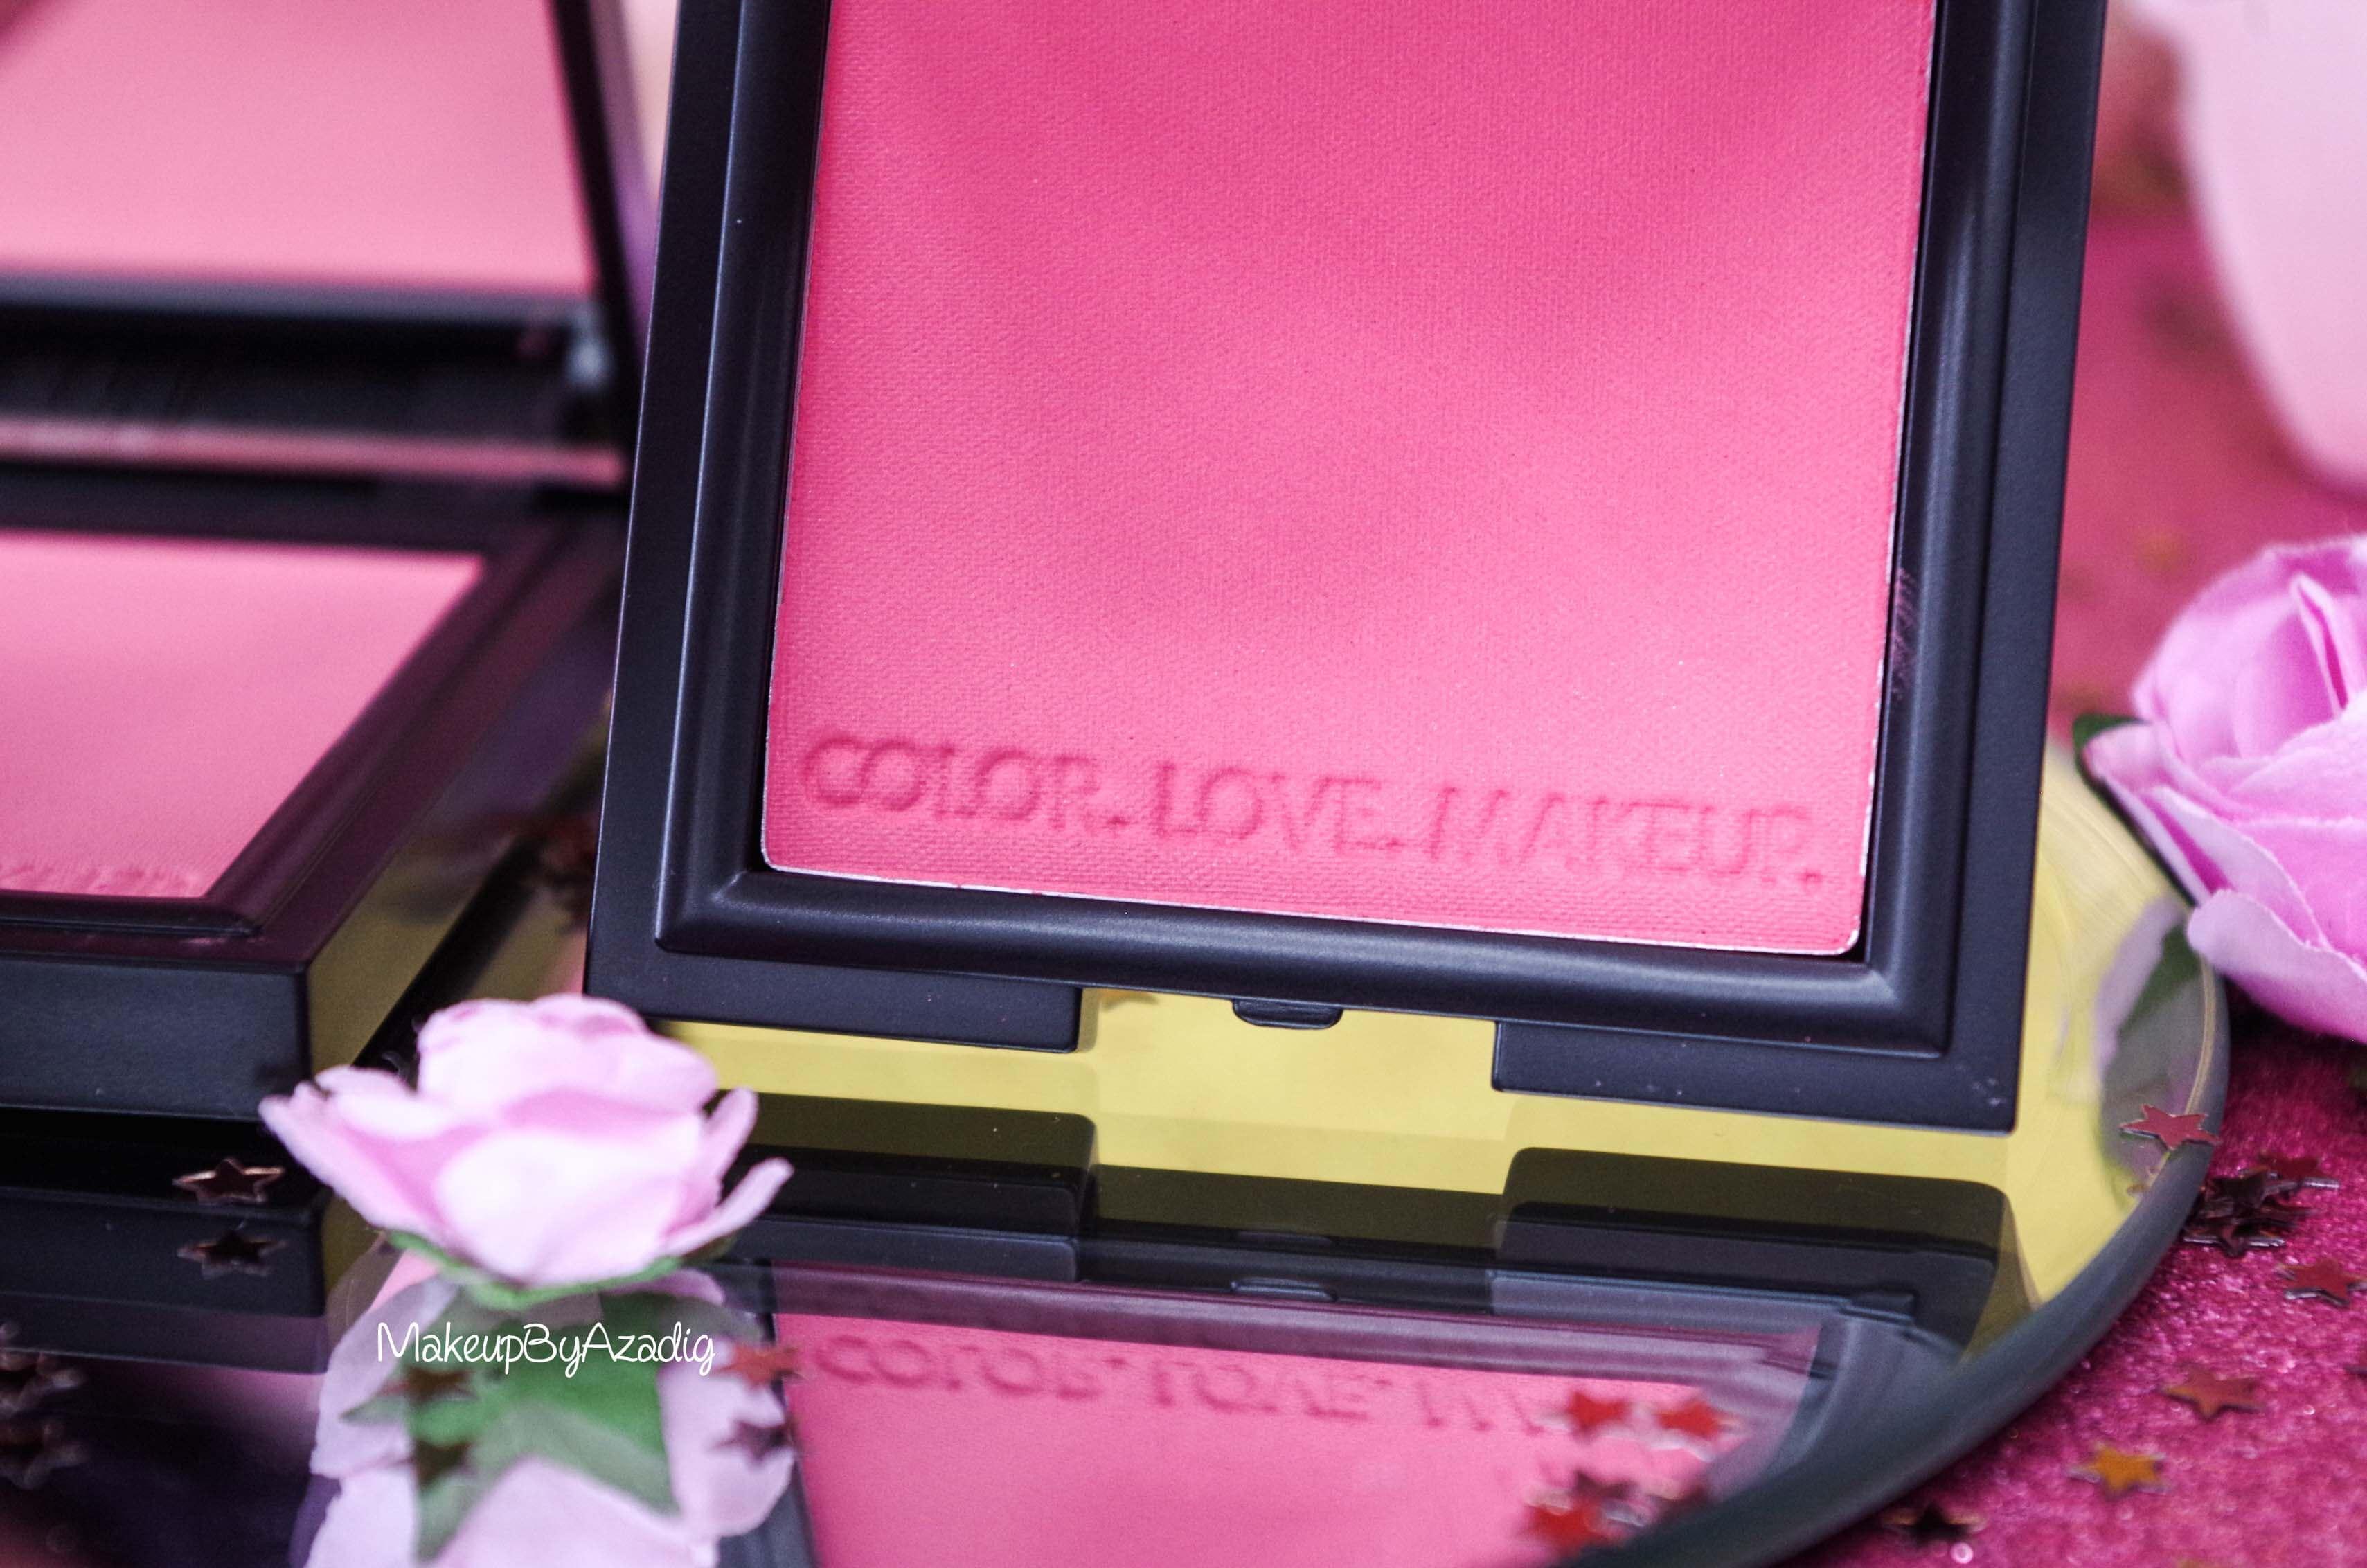 revue-review-luxe-color-blush-zoeva-sephora-france-helovesmemaybe-rush-rush-avis-swatch-makeupbyazadig-paris-corail